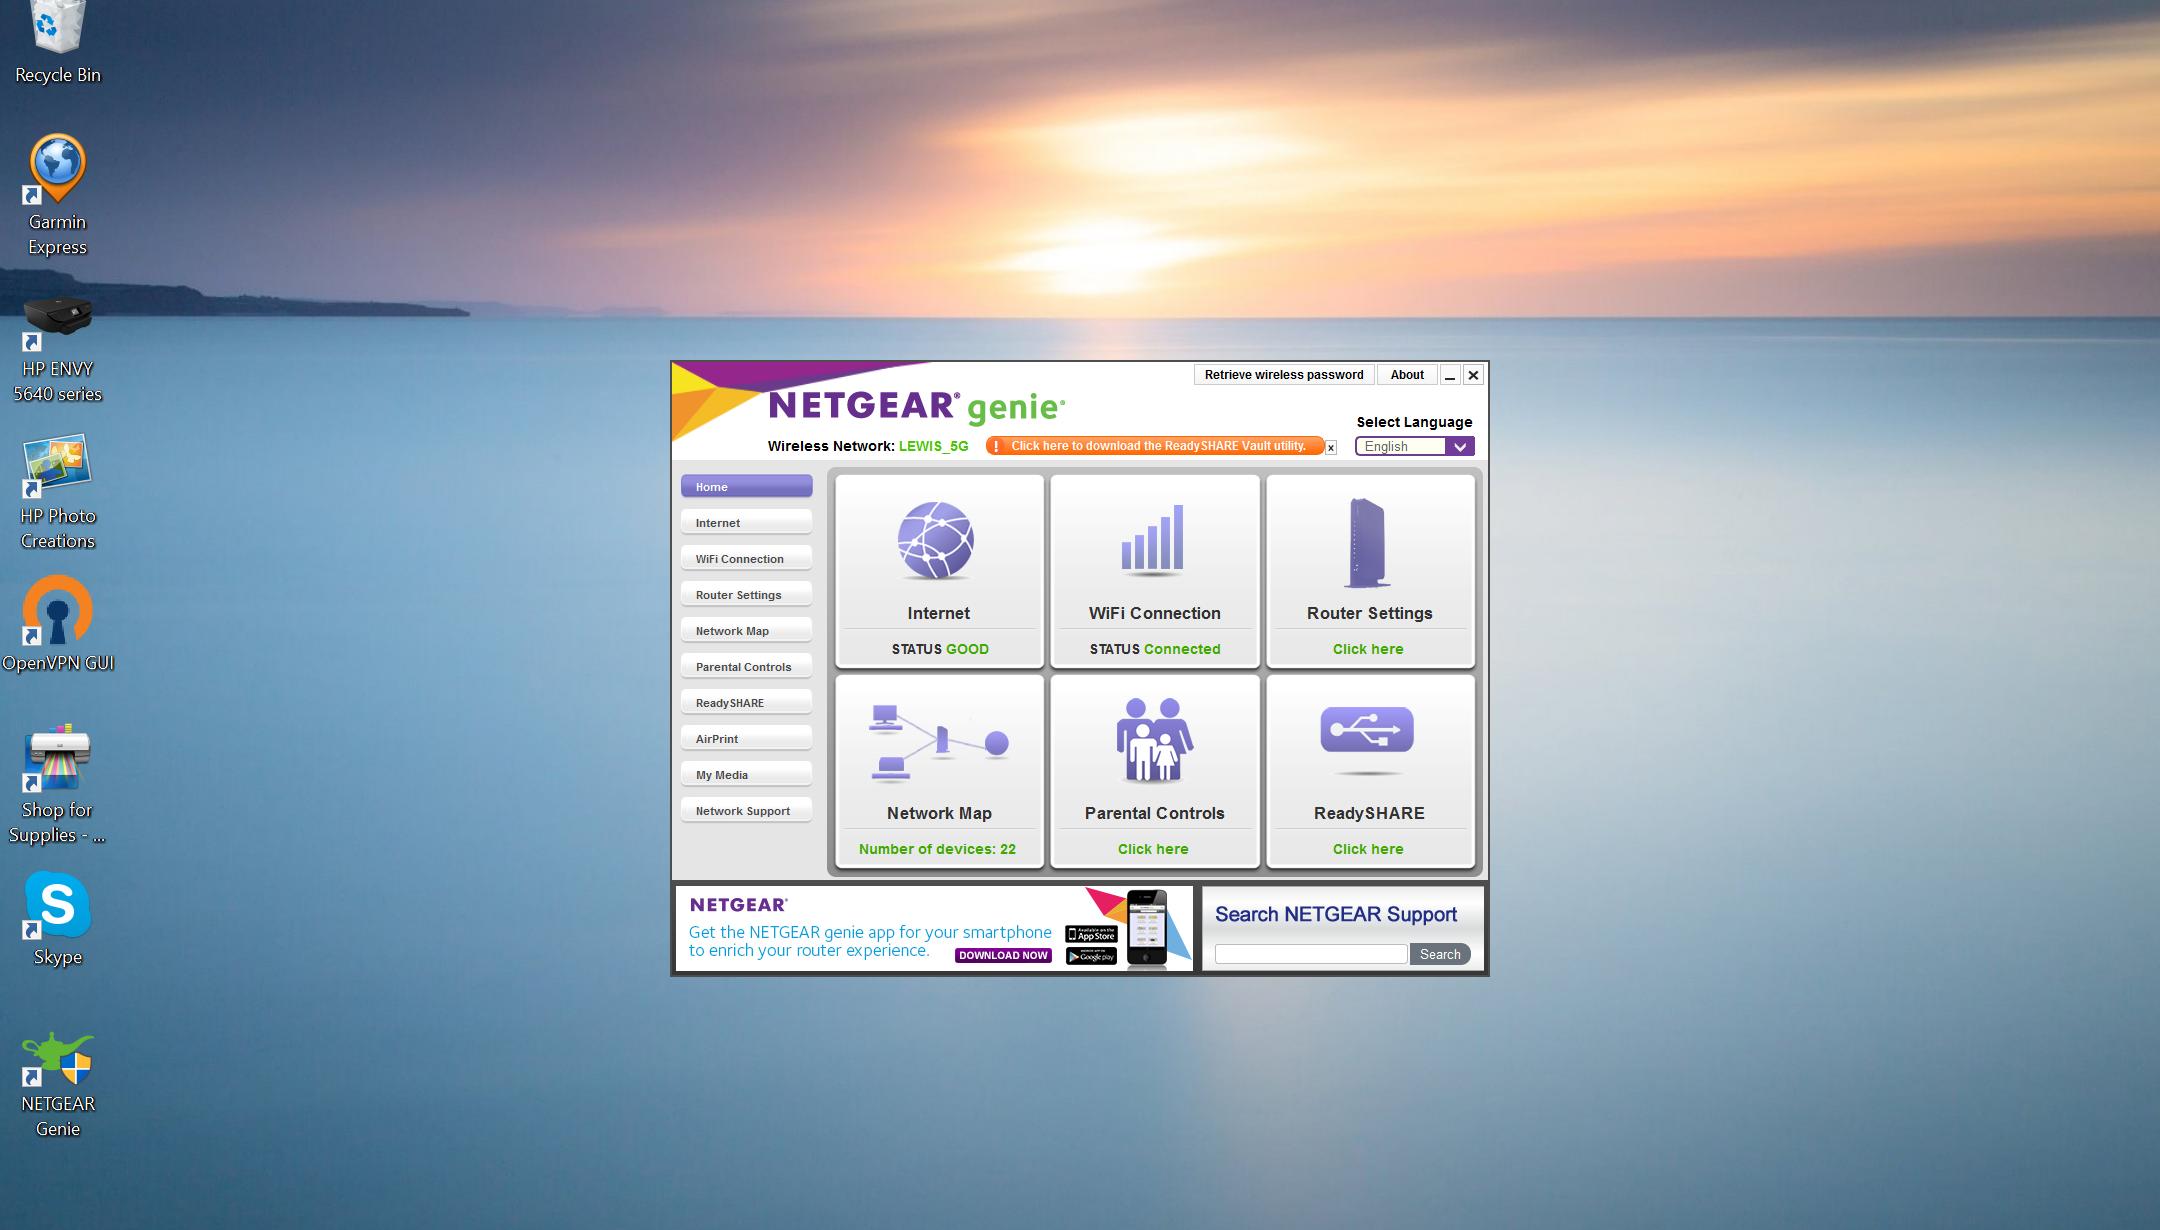 Netgear Wna1100 Driver Windows 10 Download - bertylinsight